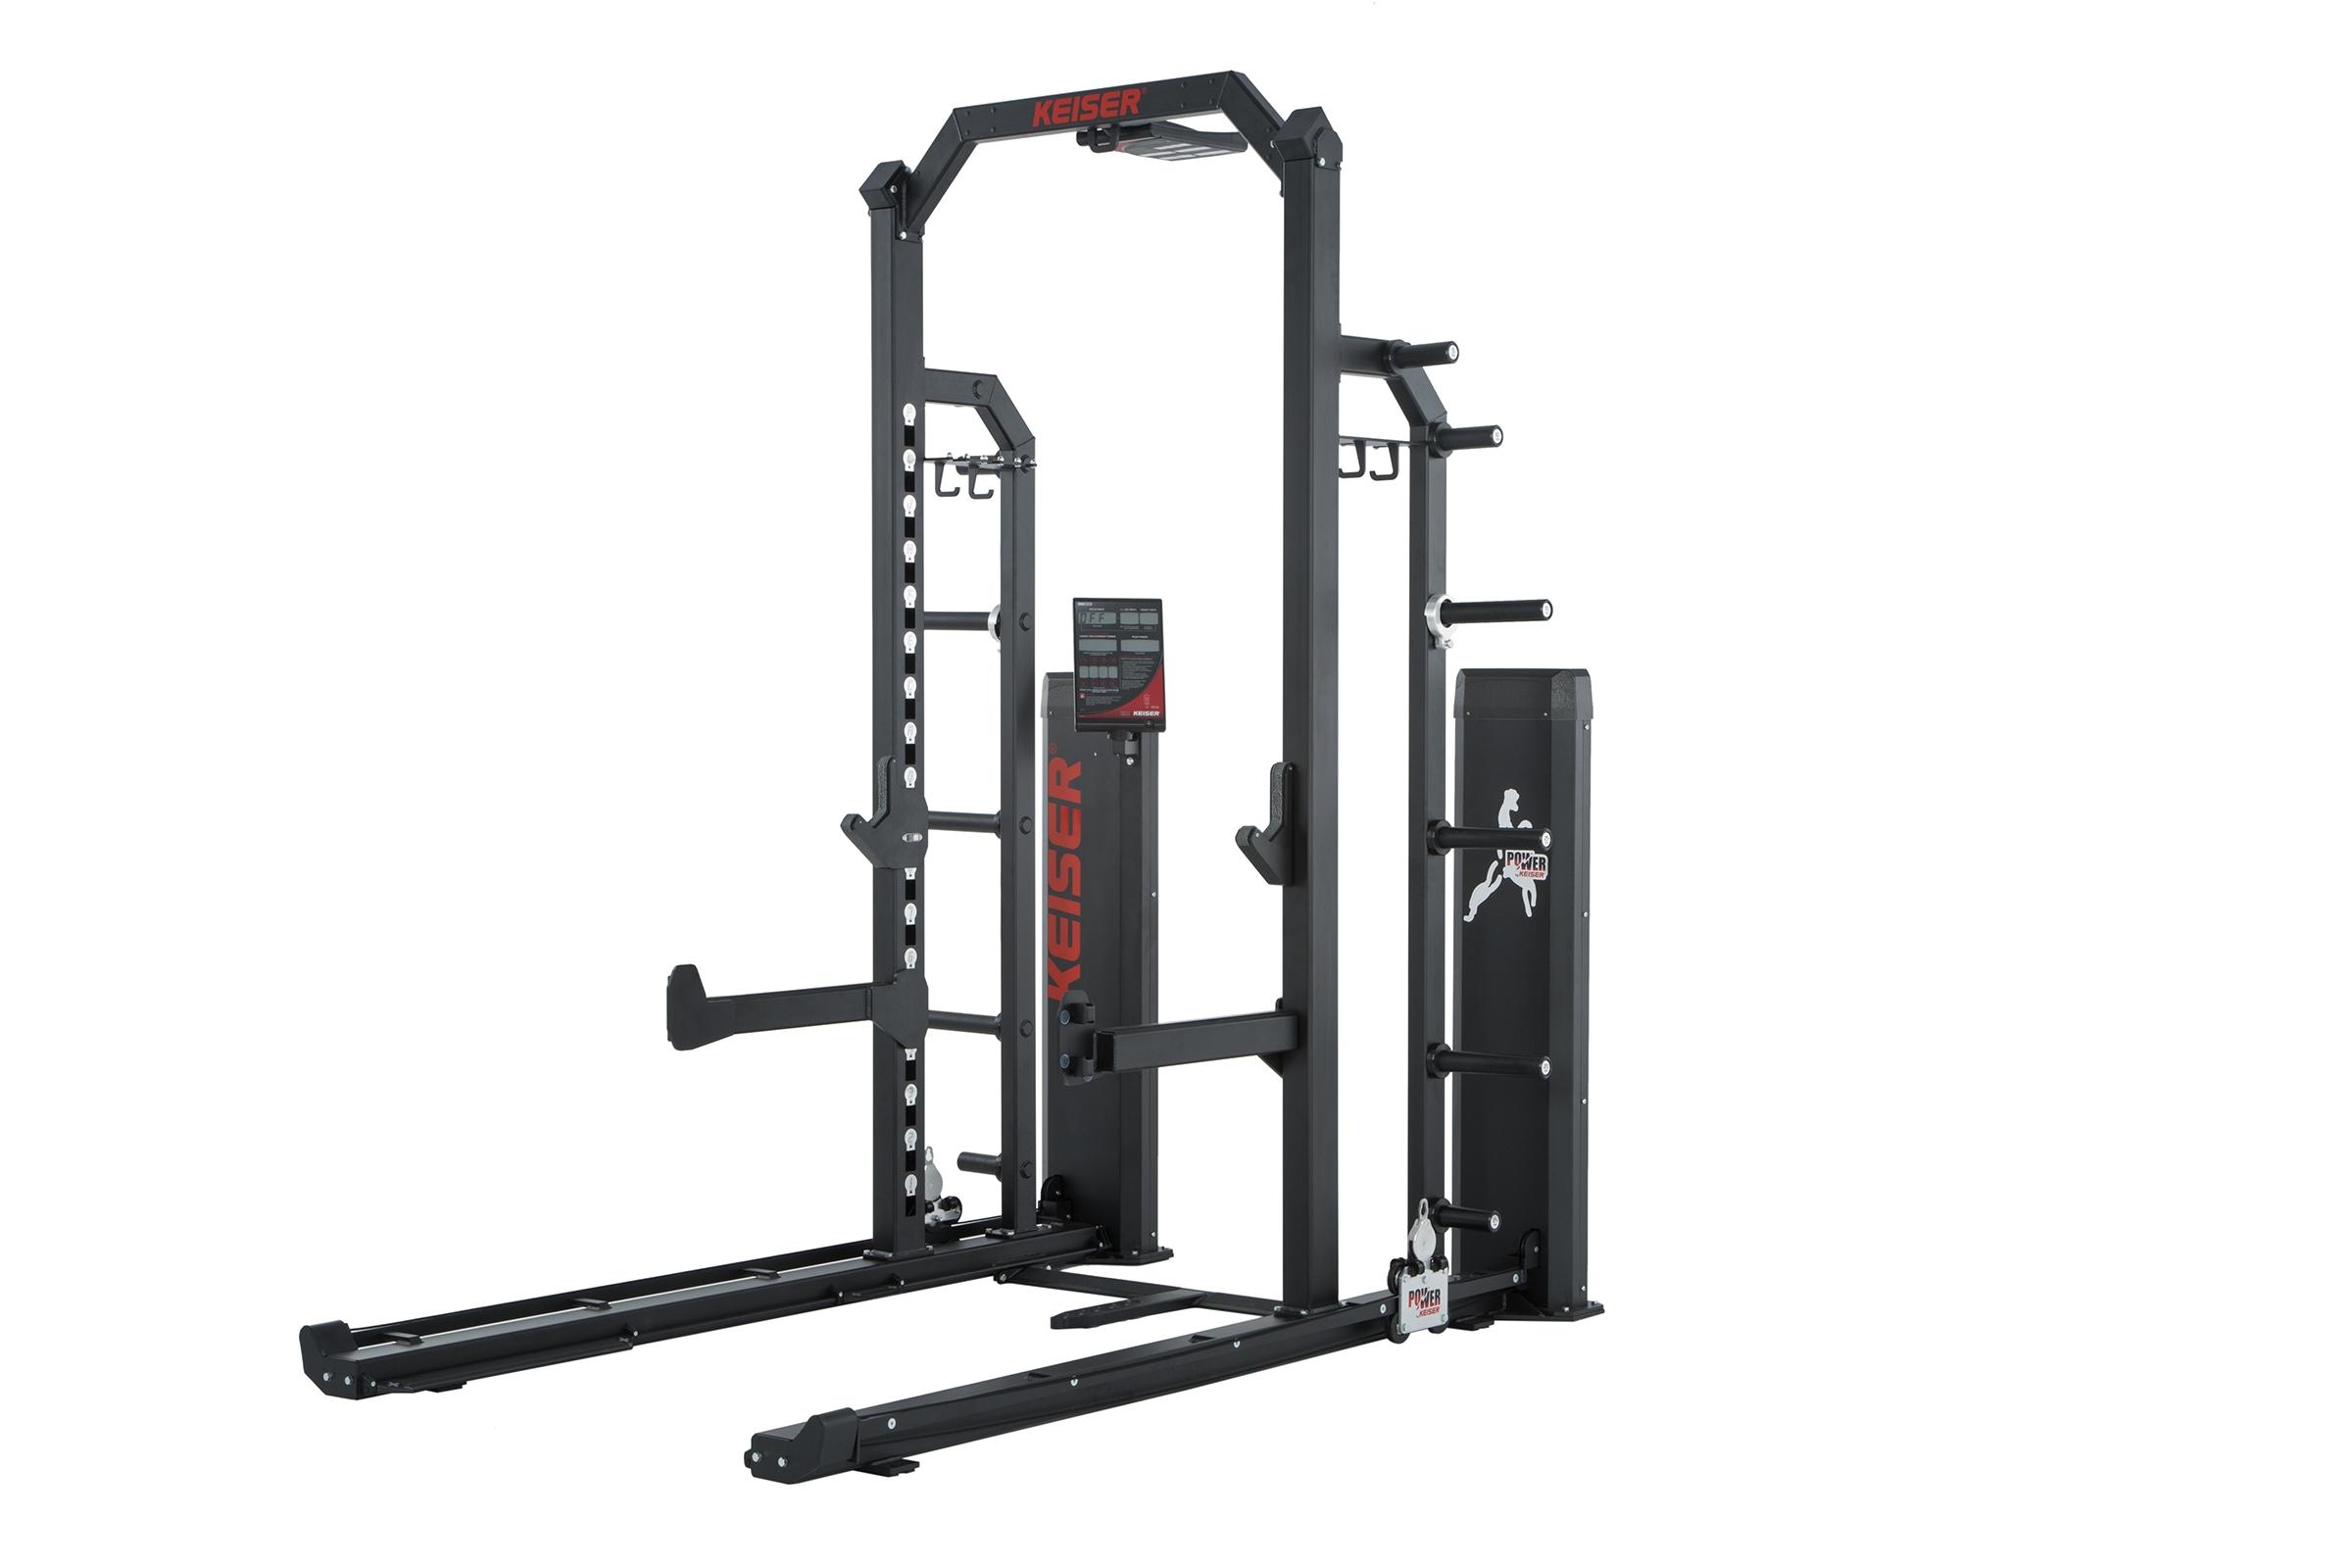 keiser half rack with air fitness machine 1030 jpg